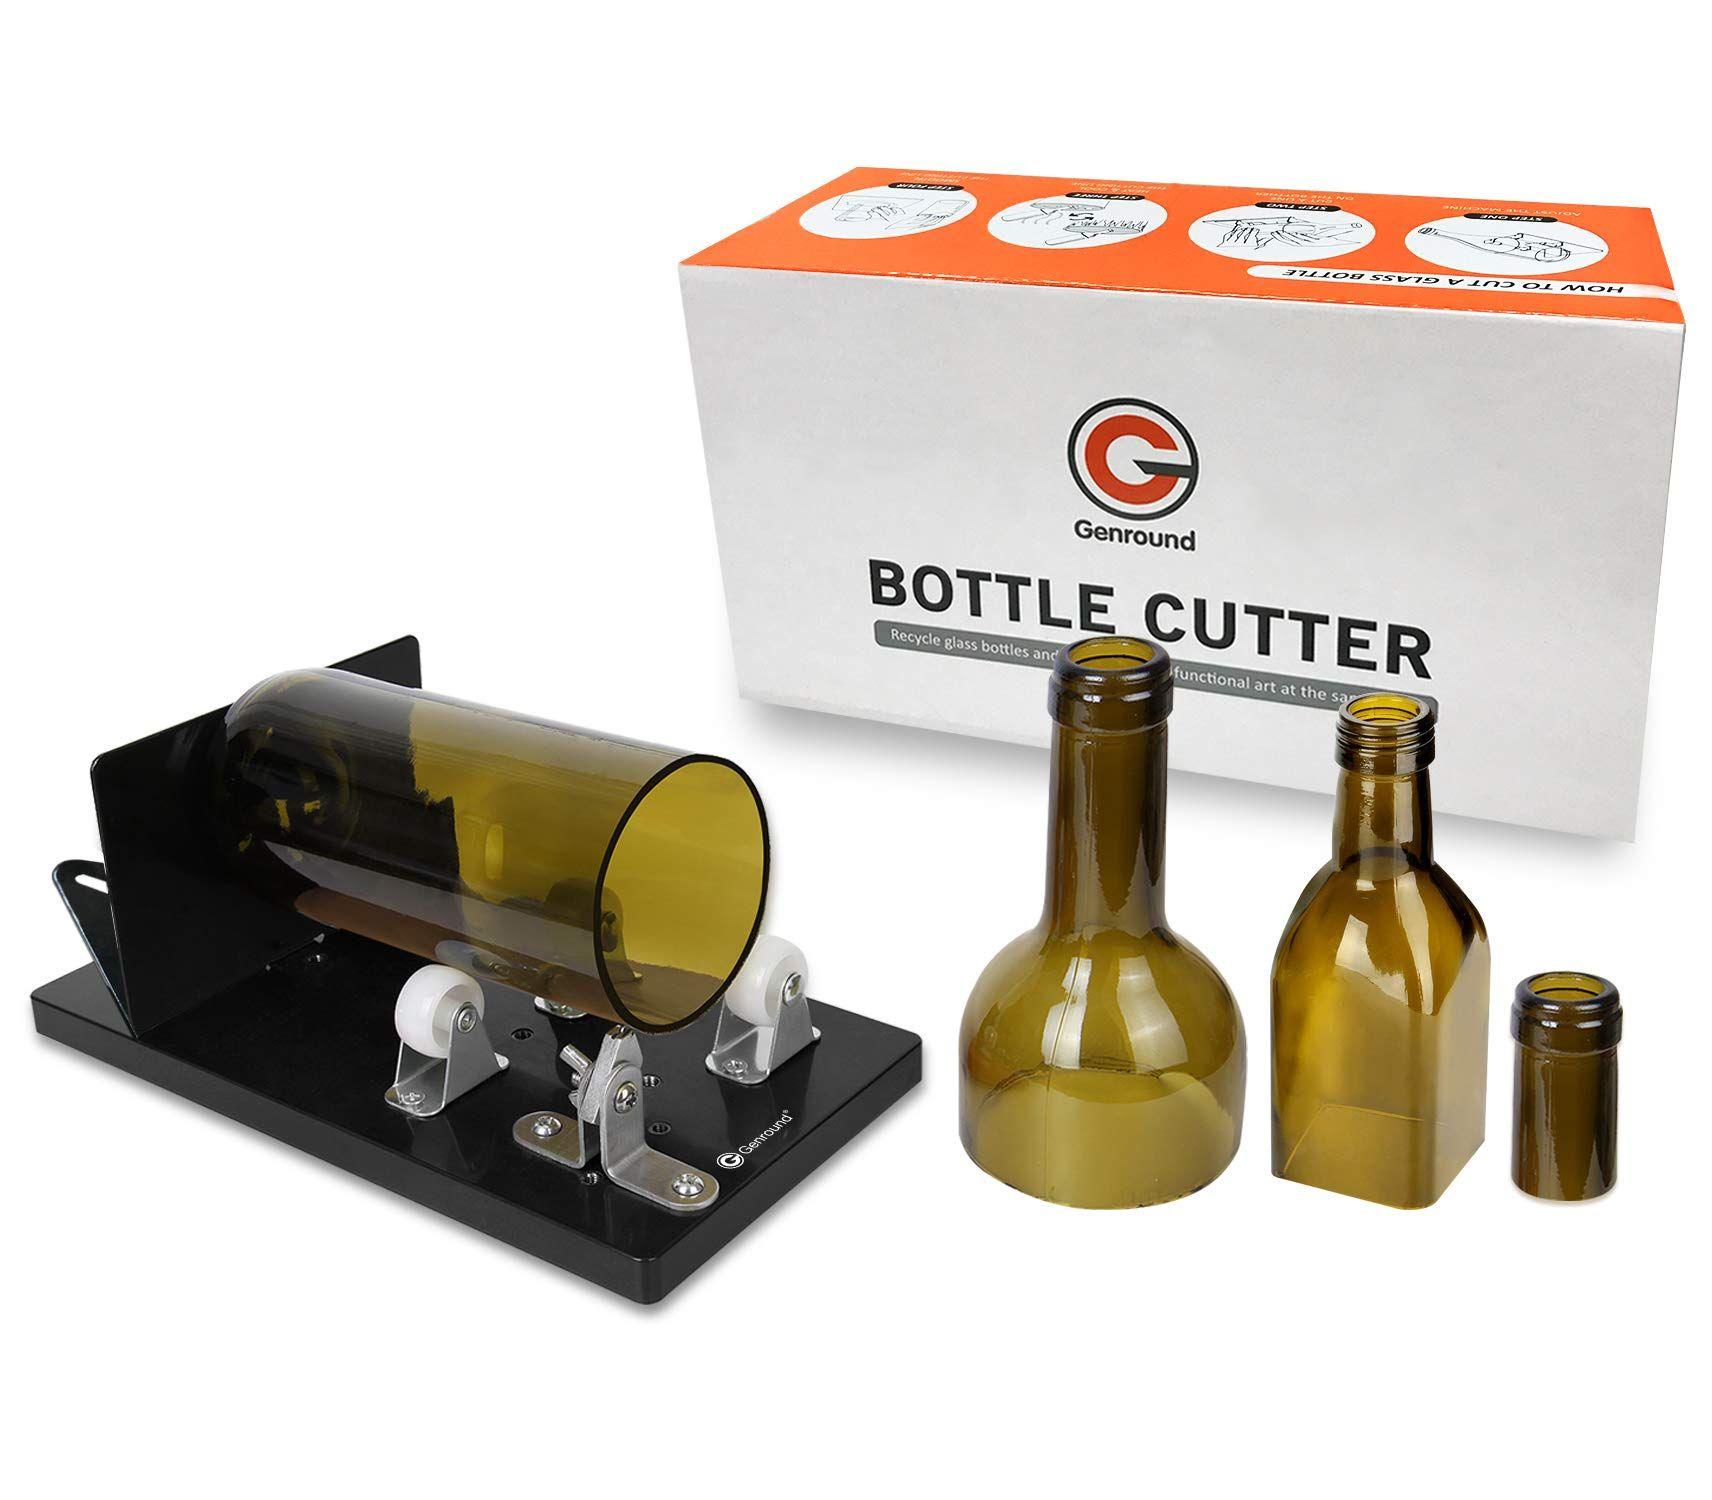 Glass Cutter Beer Wine Bottle Cut Bottles Cutting Tool for Art Craft Making DIY